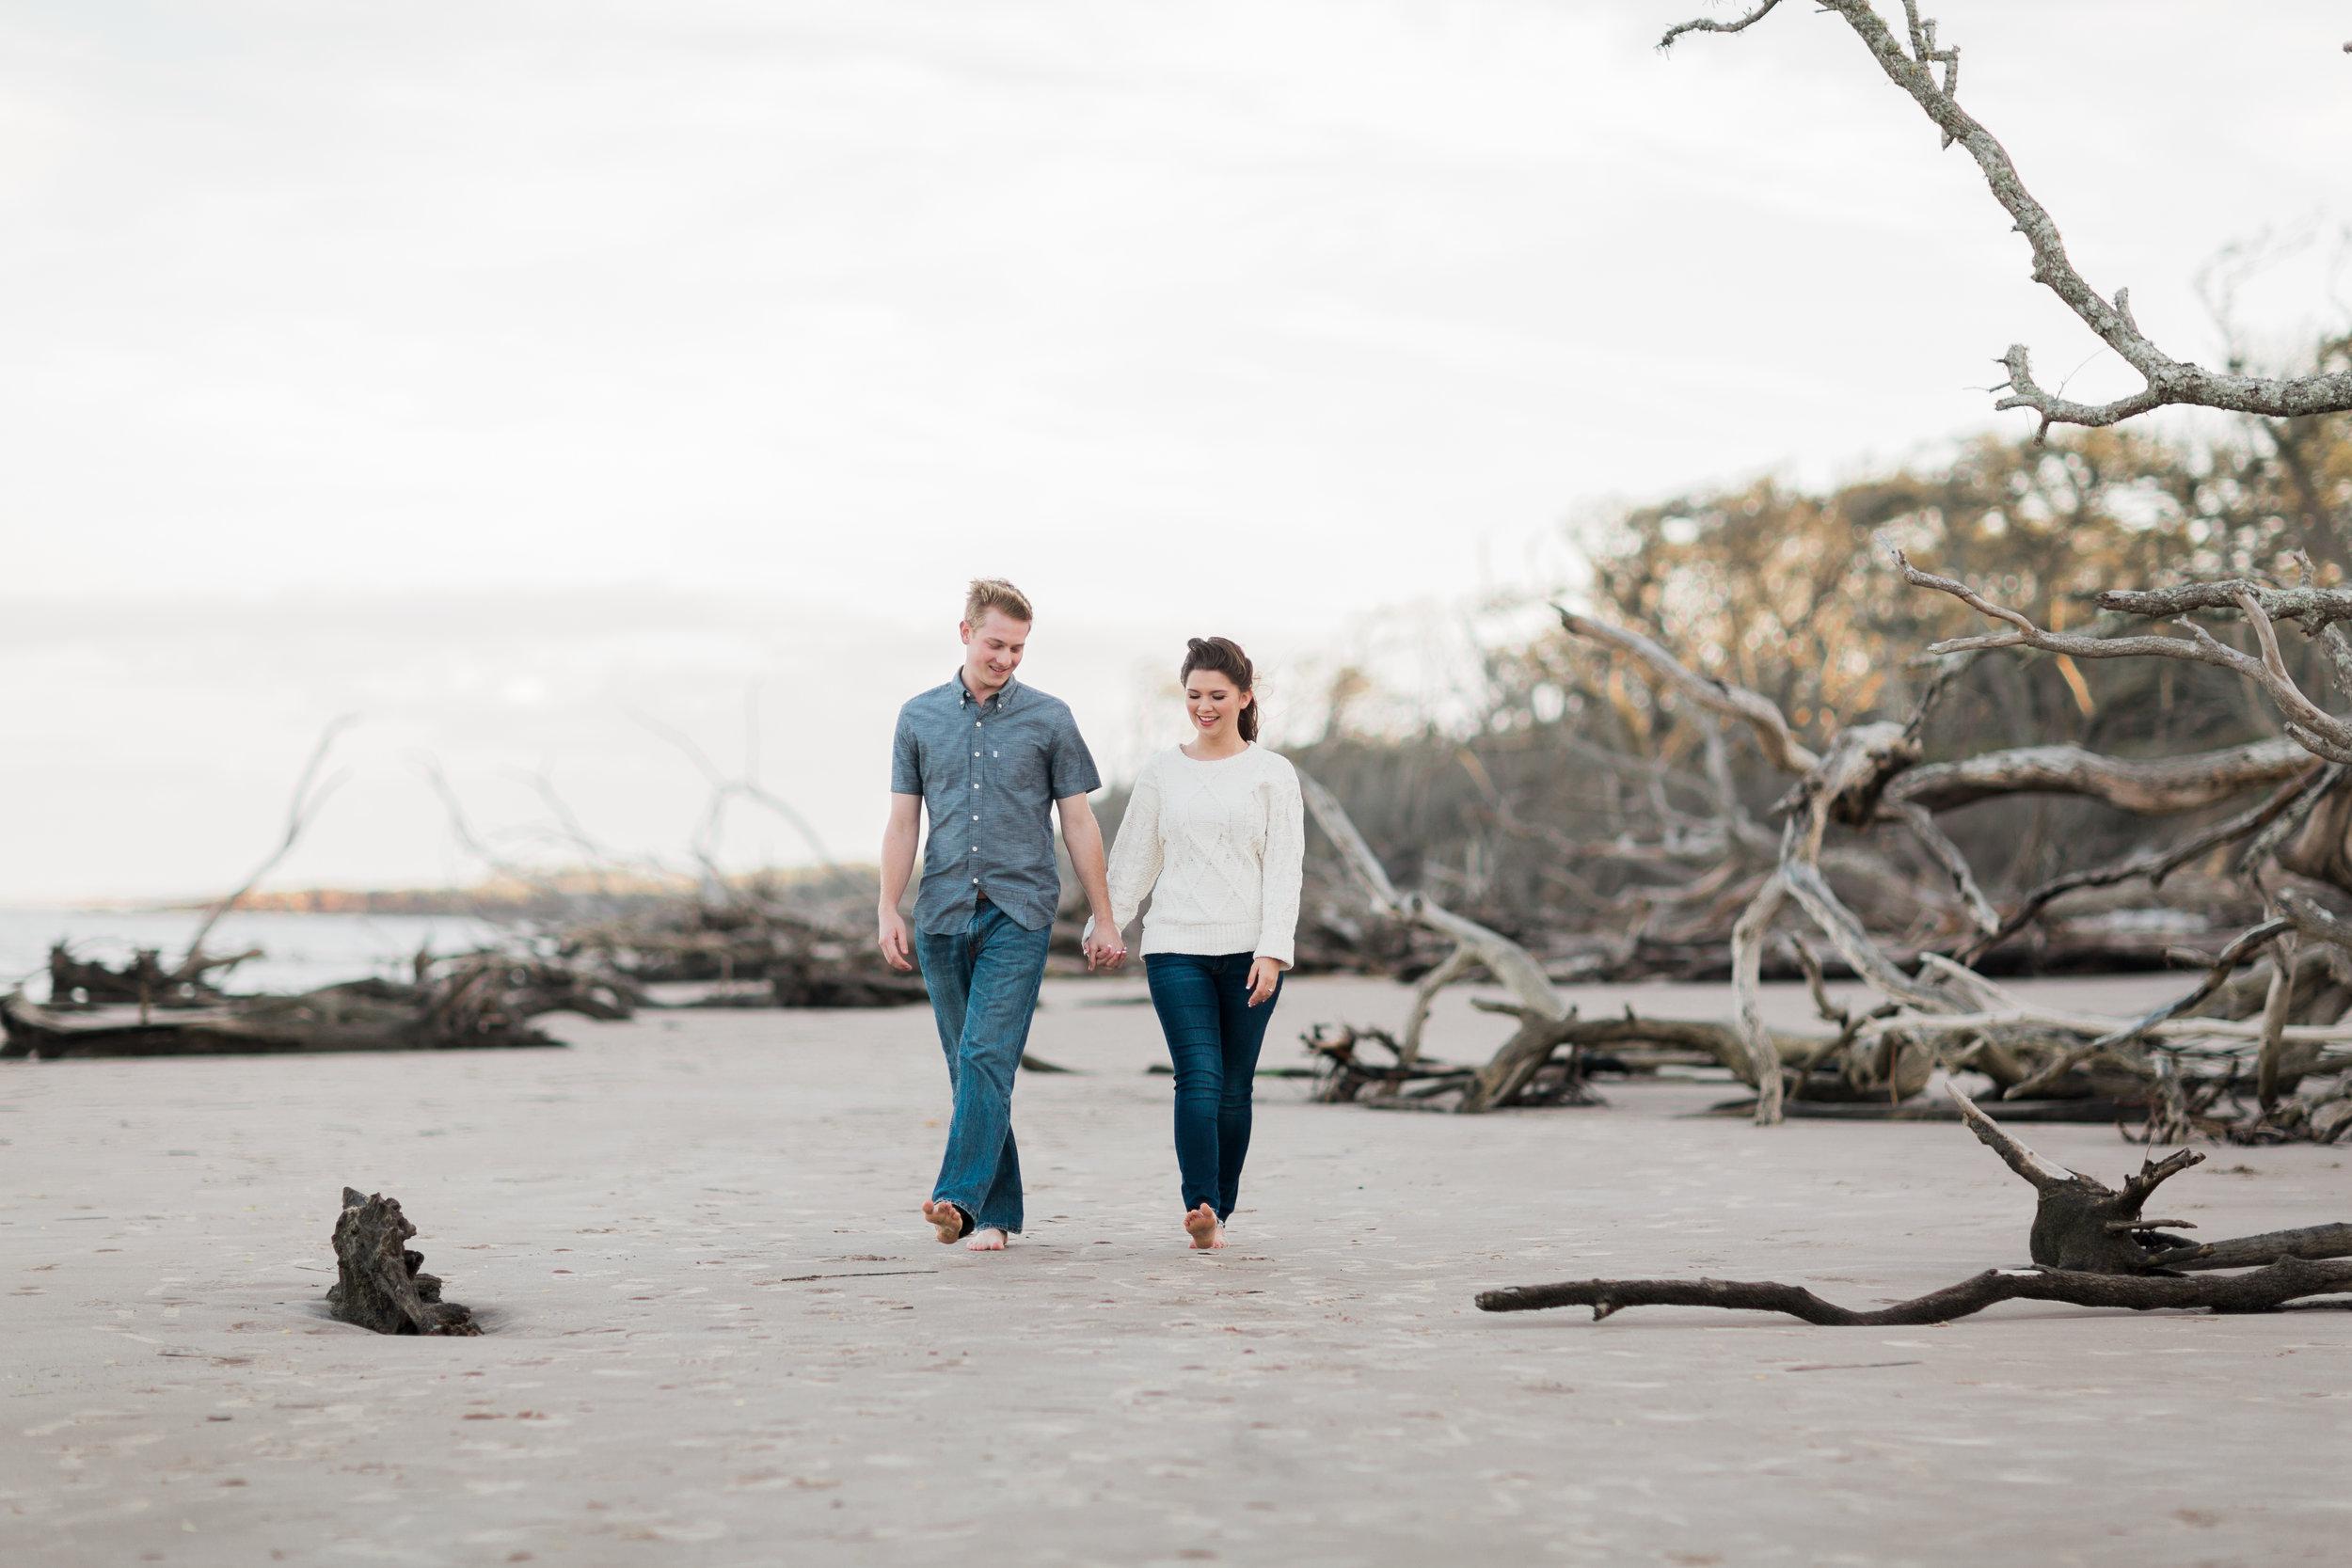 Cheyenne_Hogan_Talbot_Island_Driftwood_Beach_Engagement_Photography__0002.jpg